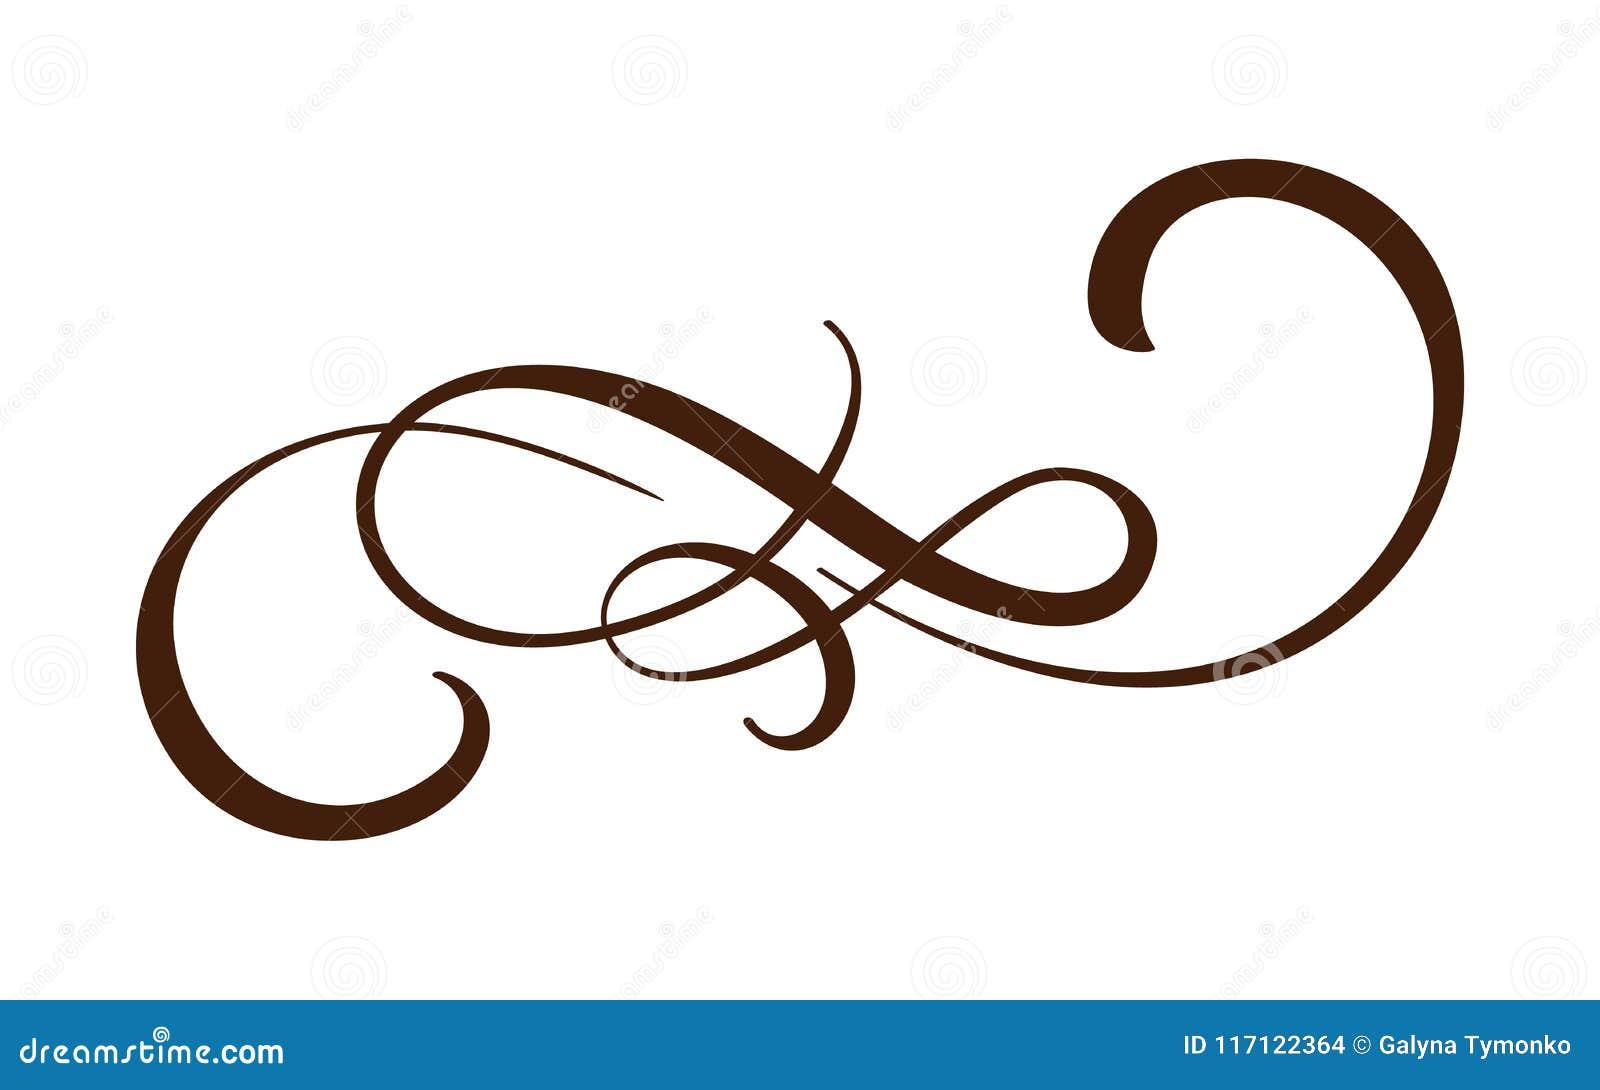 Hand drawn border flourish separator Calligraphy designer elements. Vector vintage wedding illustration Isolated on